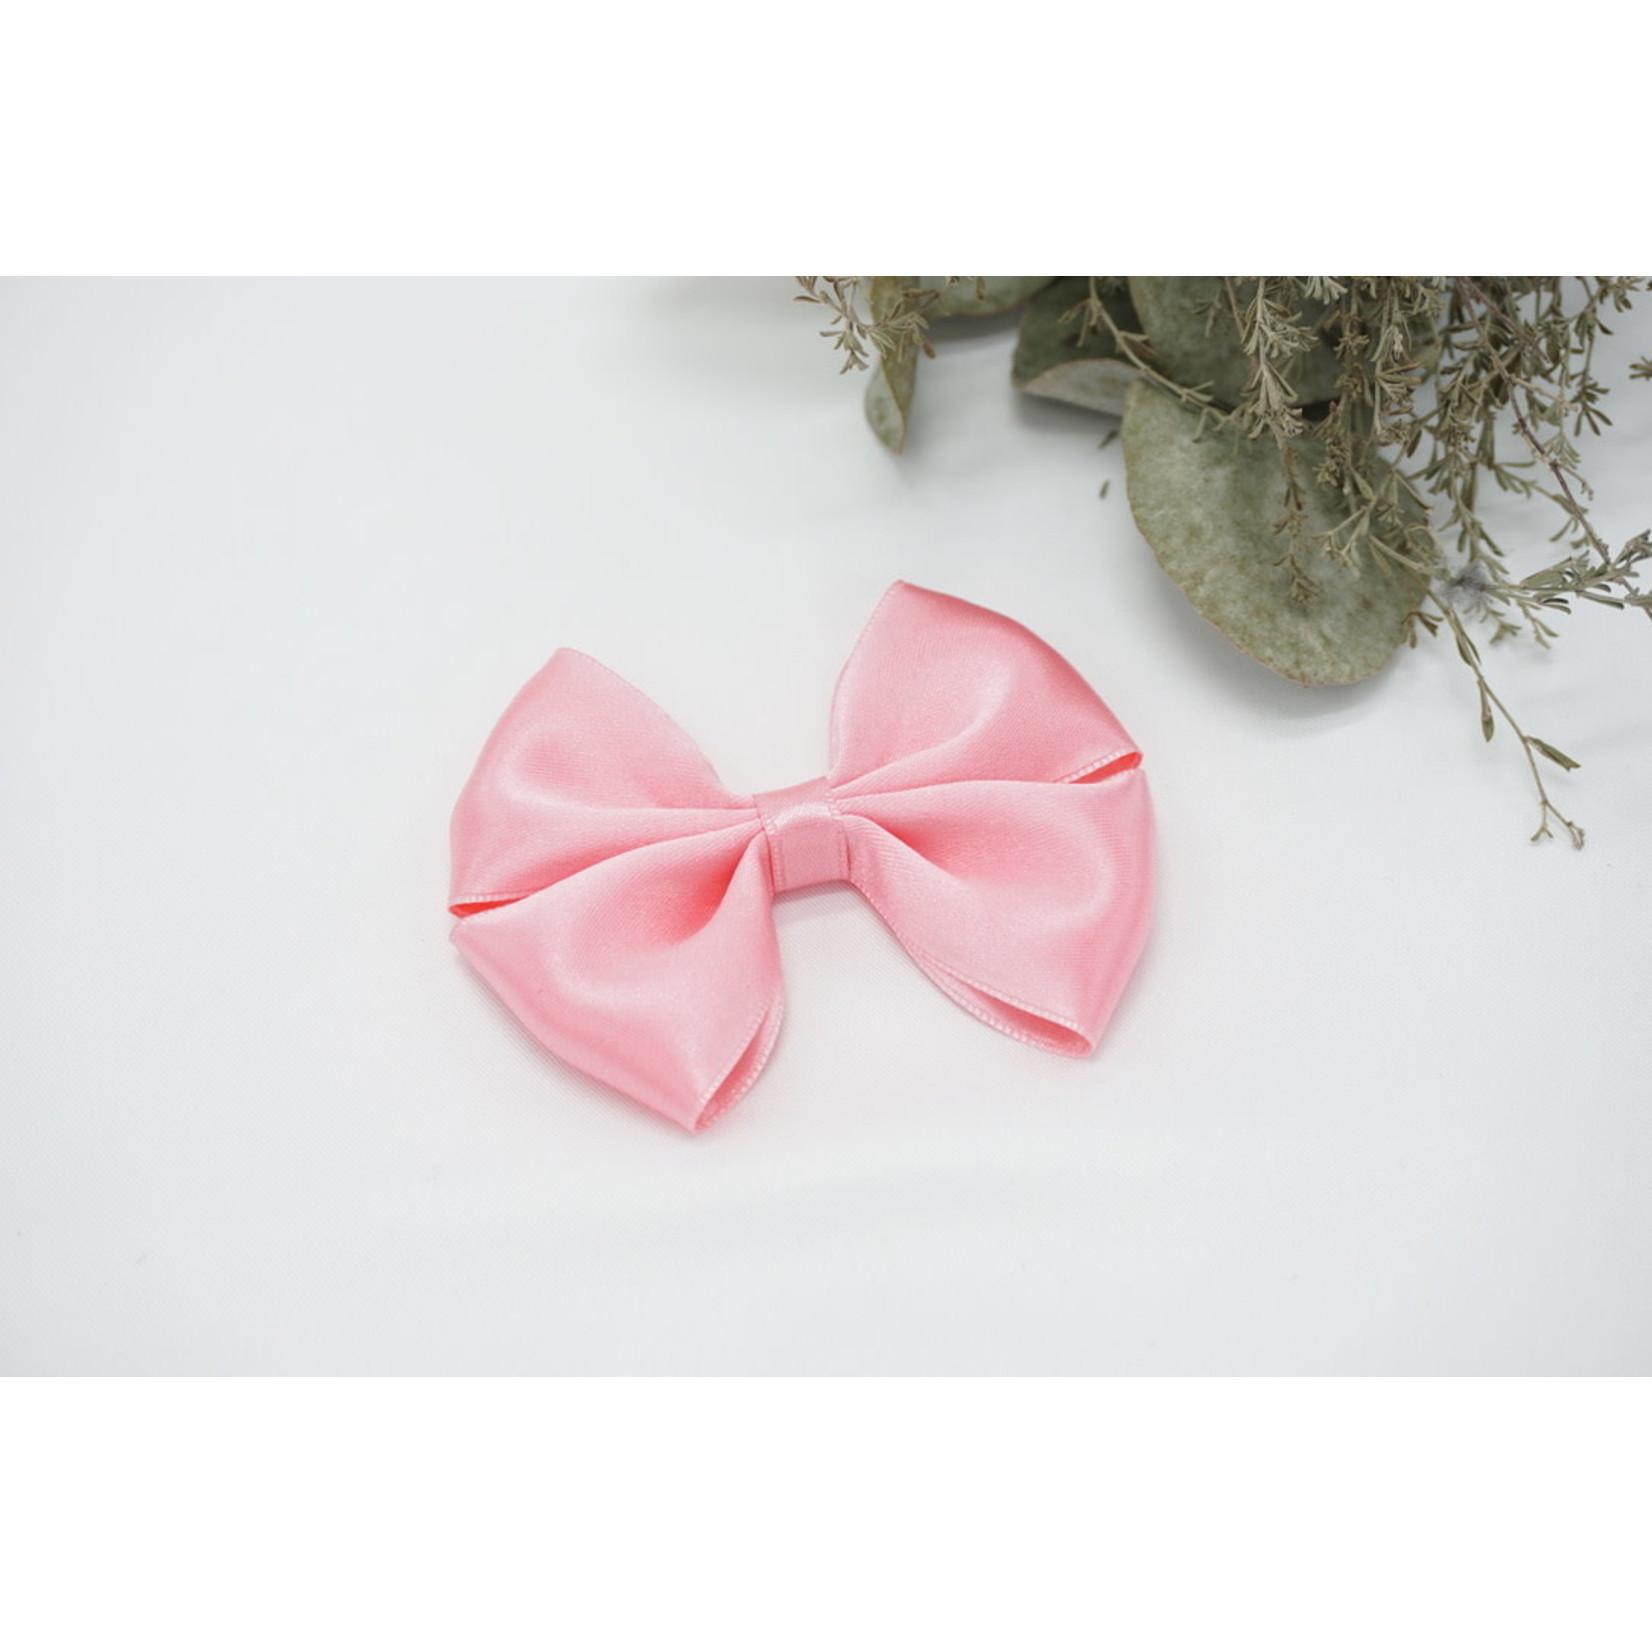 Petite Zara Satin Bow - Bright Pink